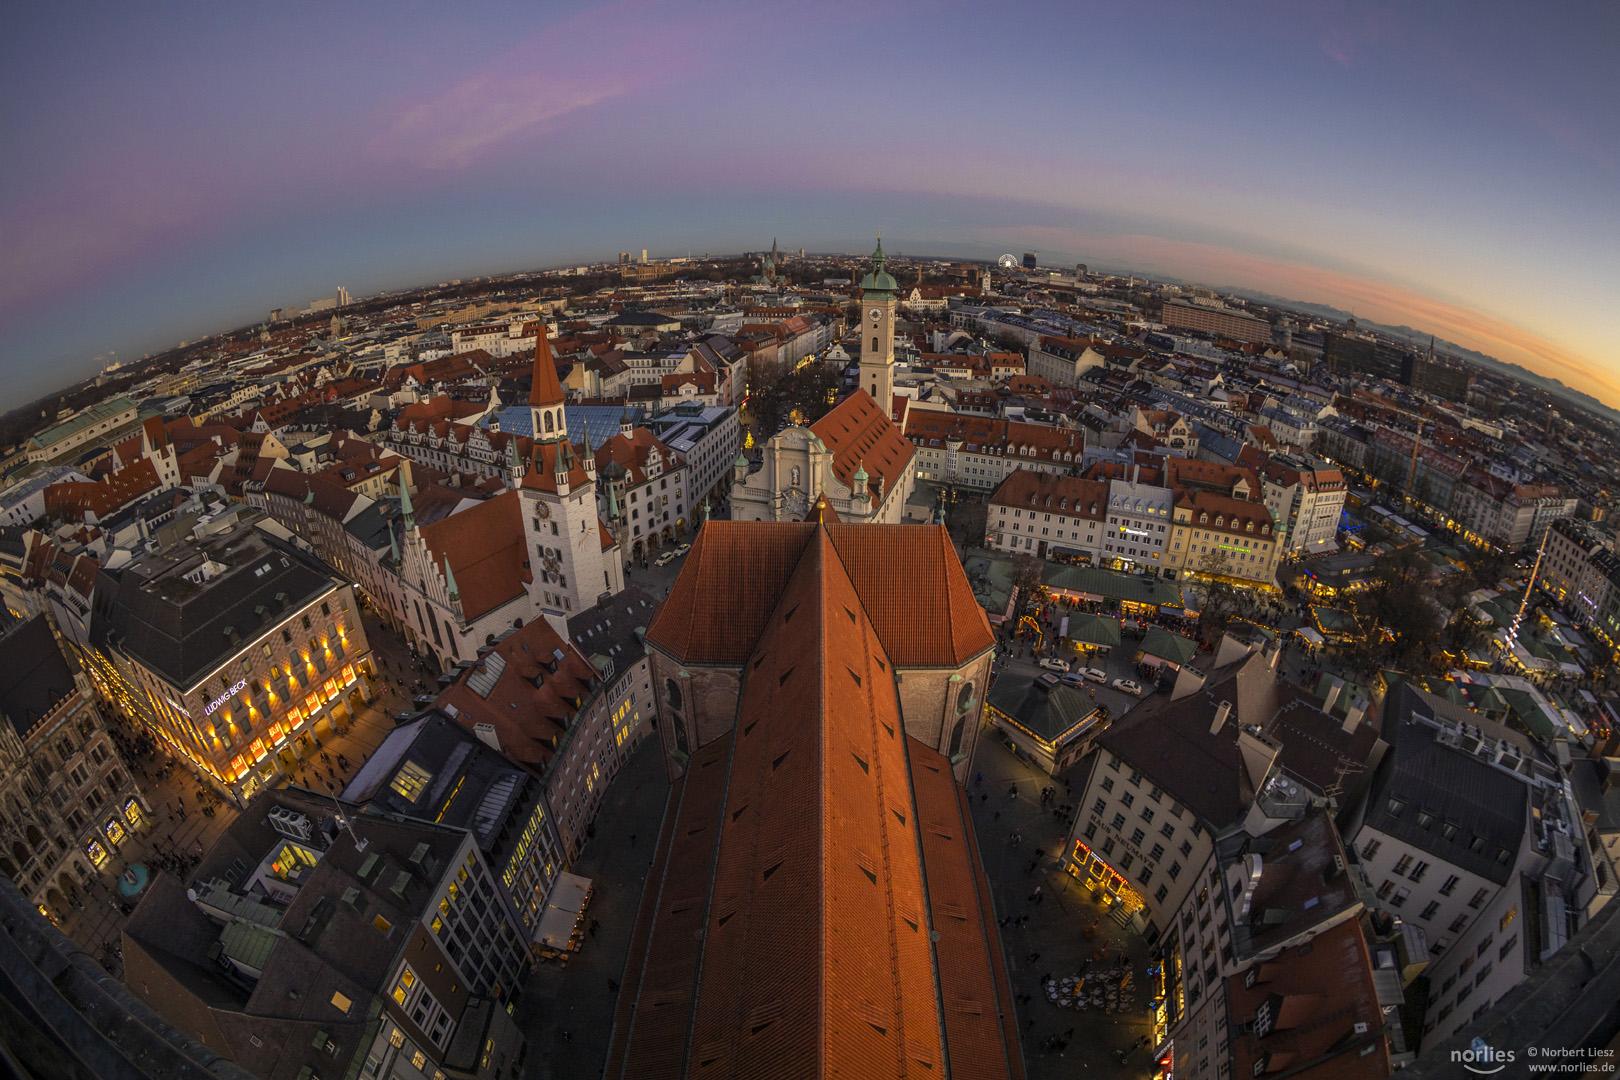 View over Munich